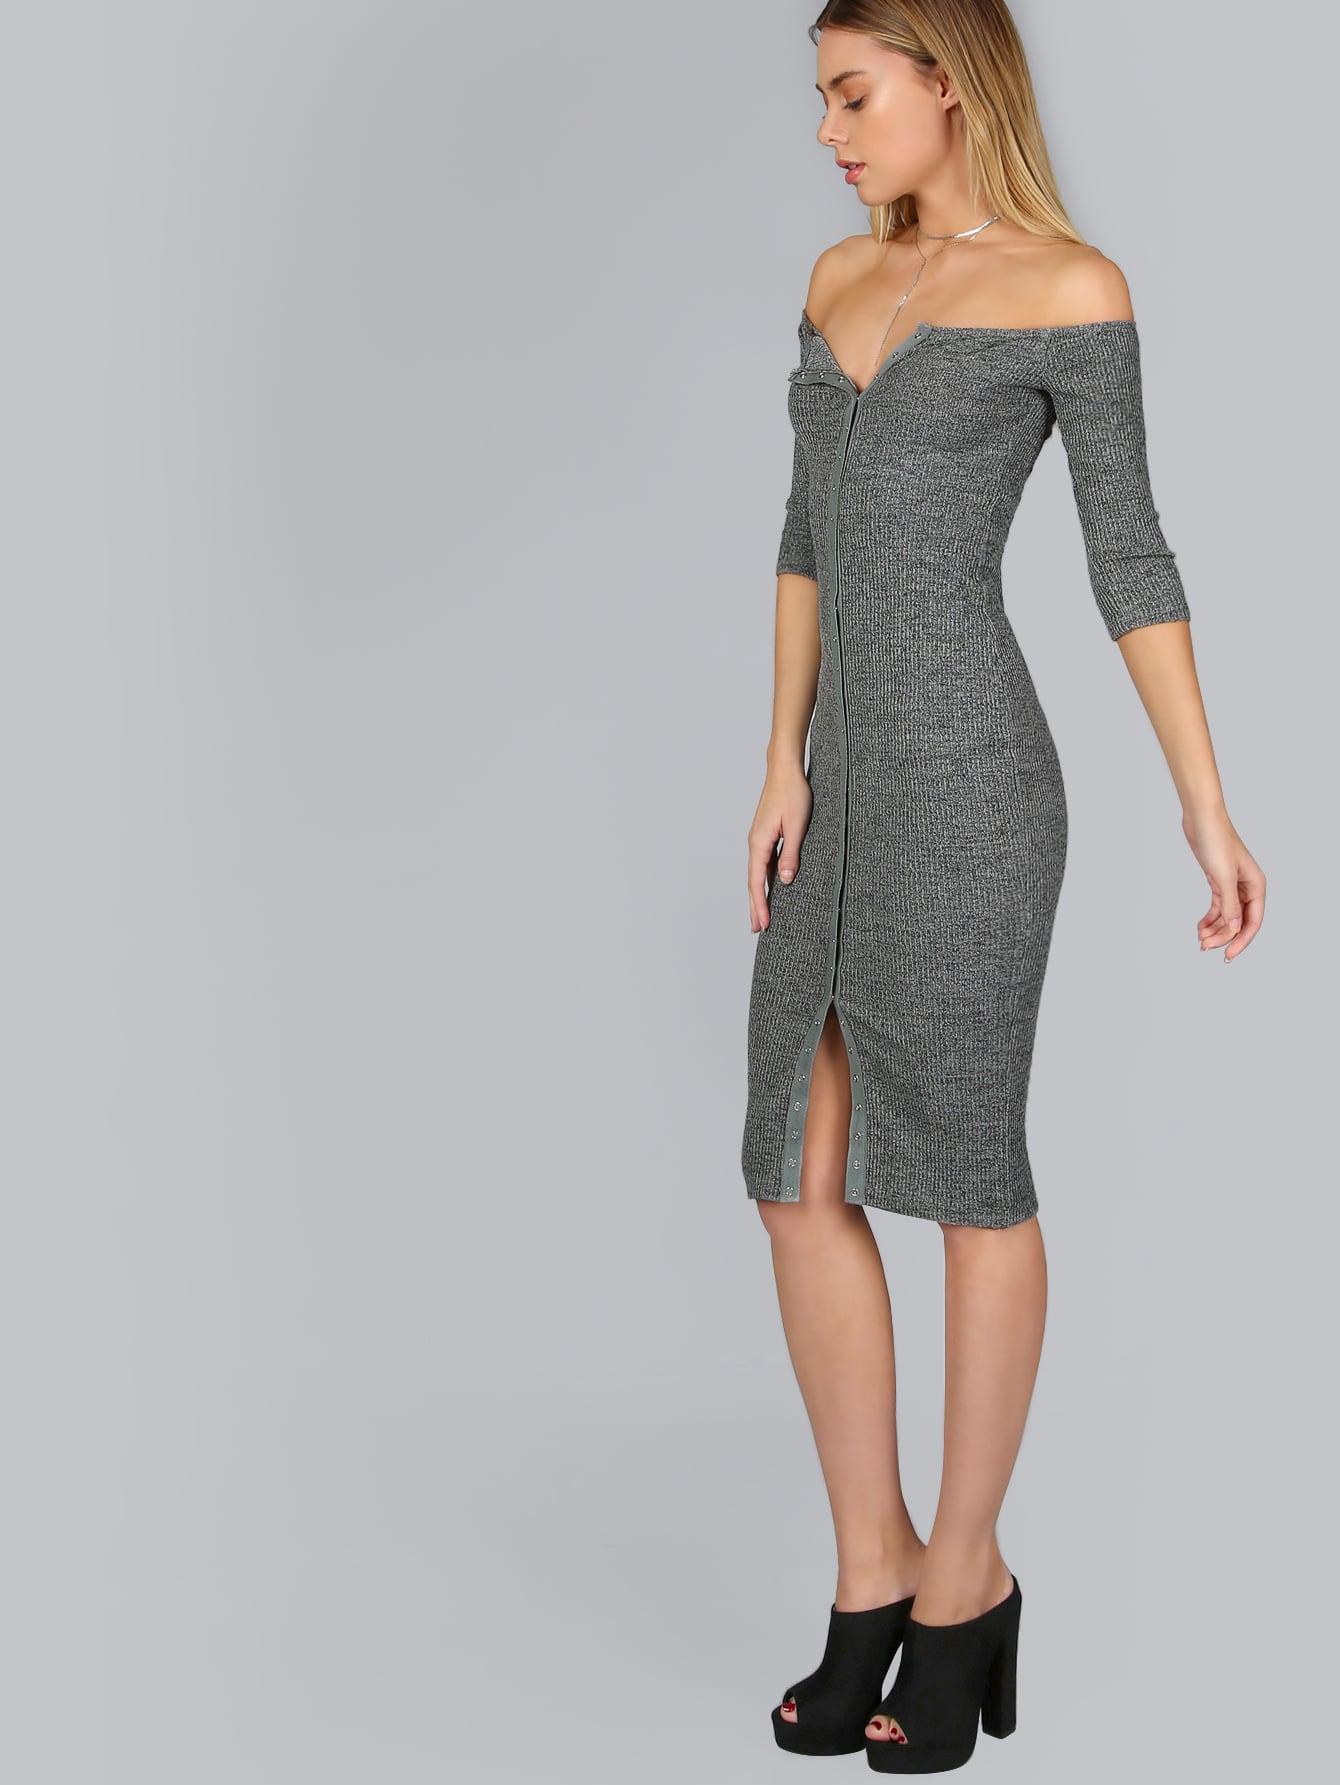 Grey Button Up Off The Shoulder Ribbed Dress dressmmc161024702